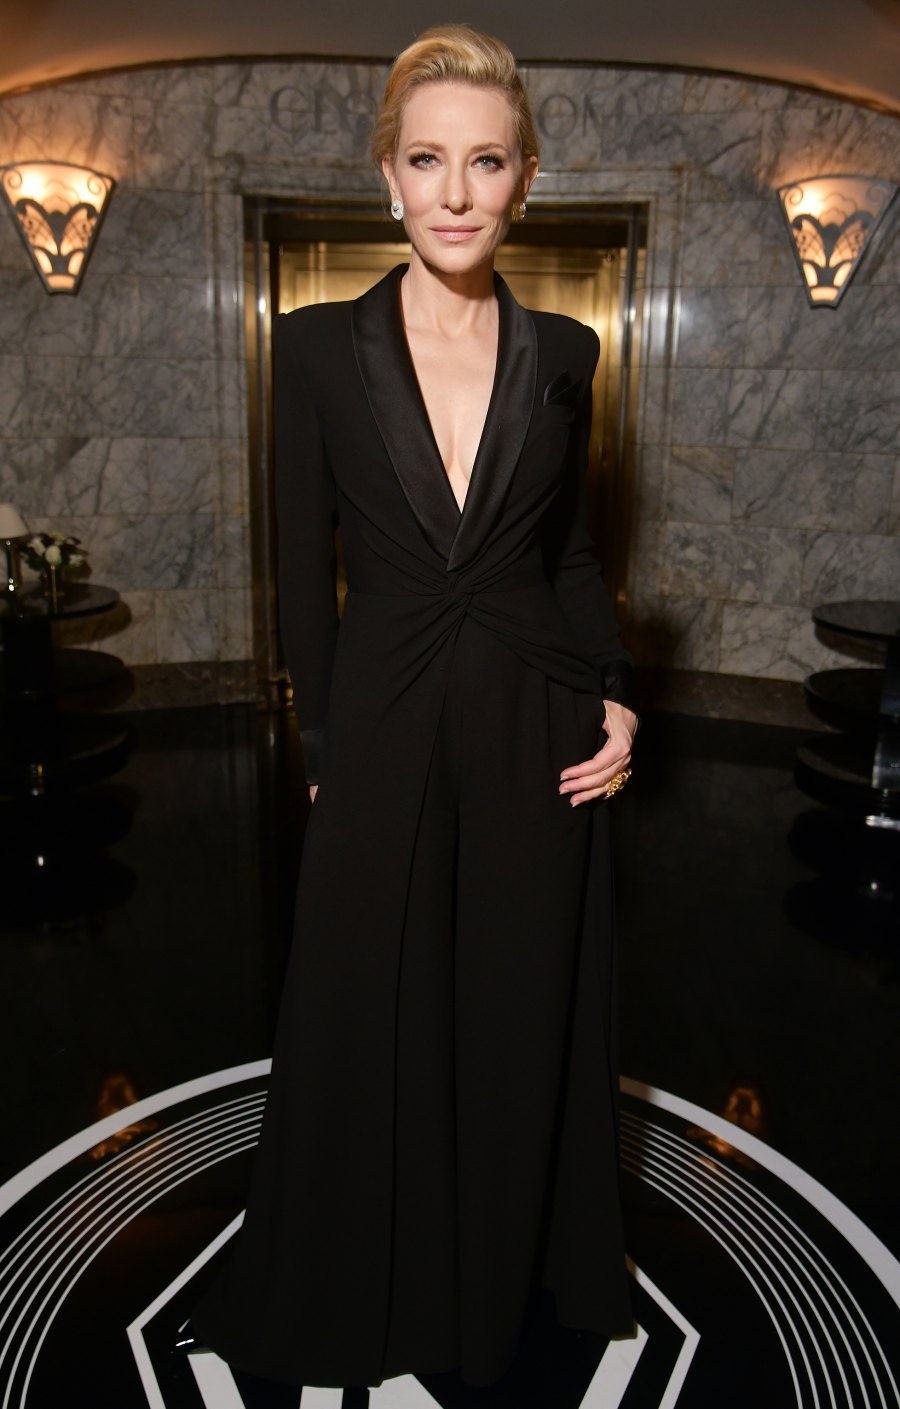 NYFW Style - Cate Blanchett